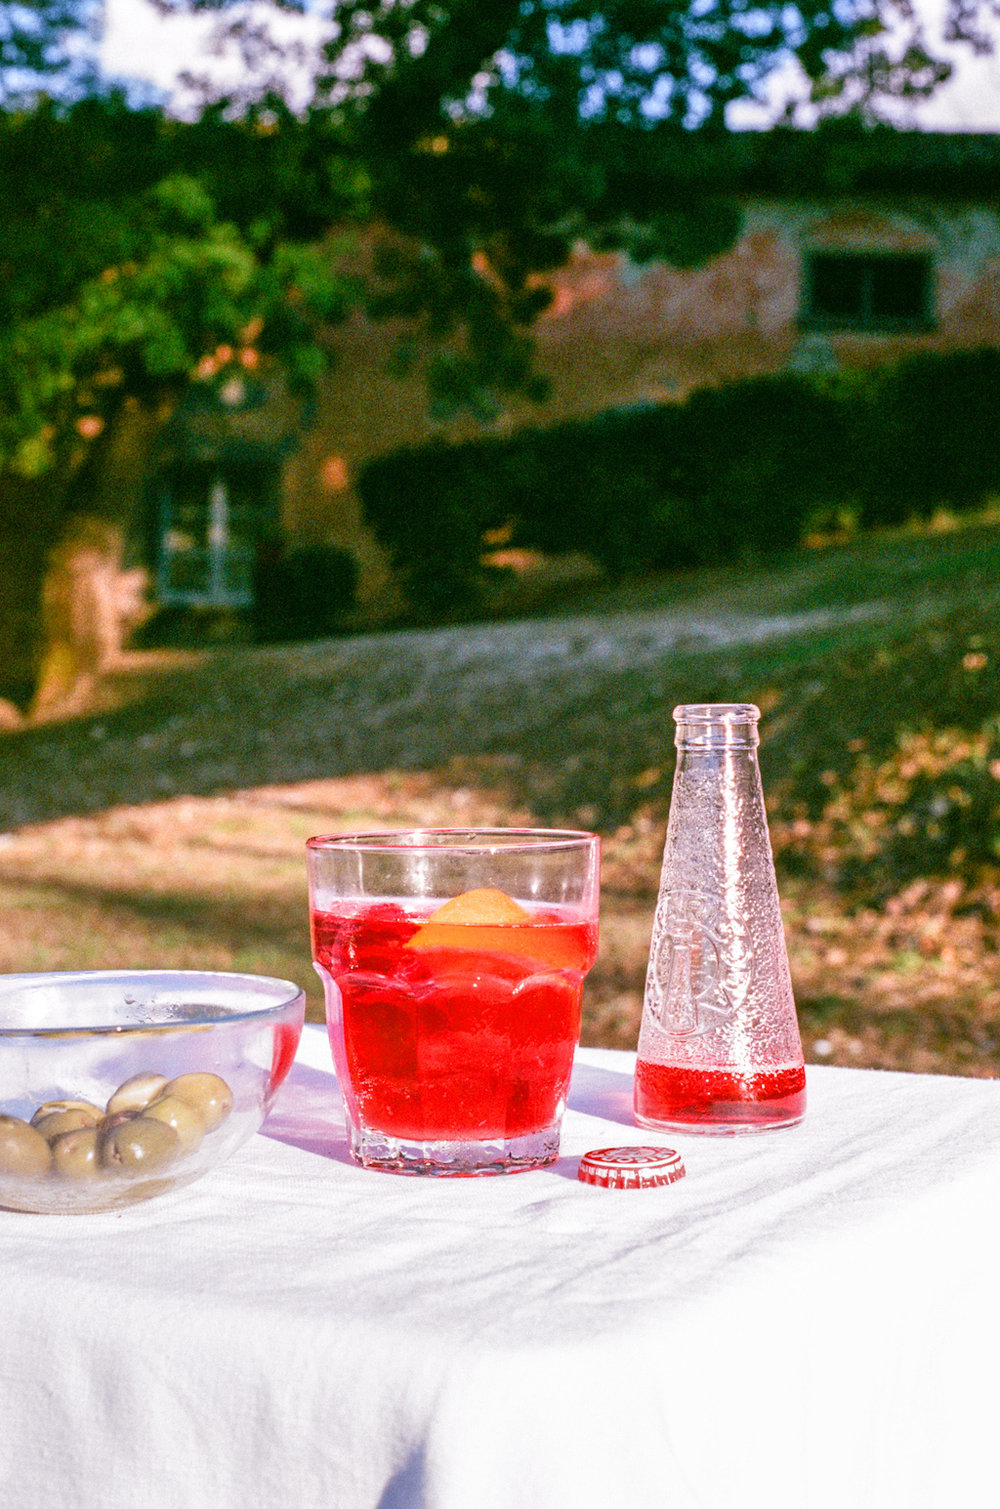 Food_and_drink-18.jpg